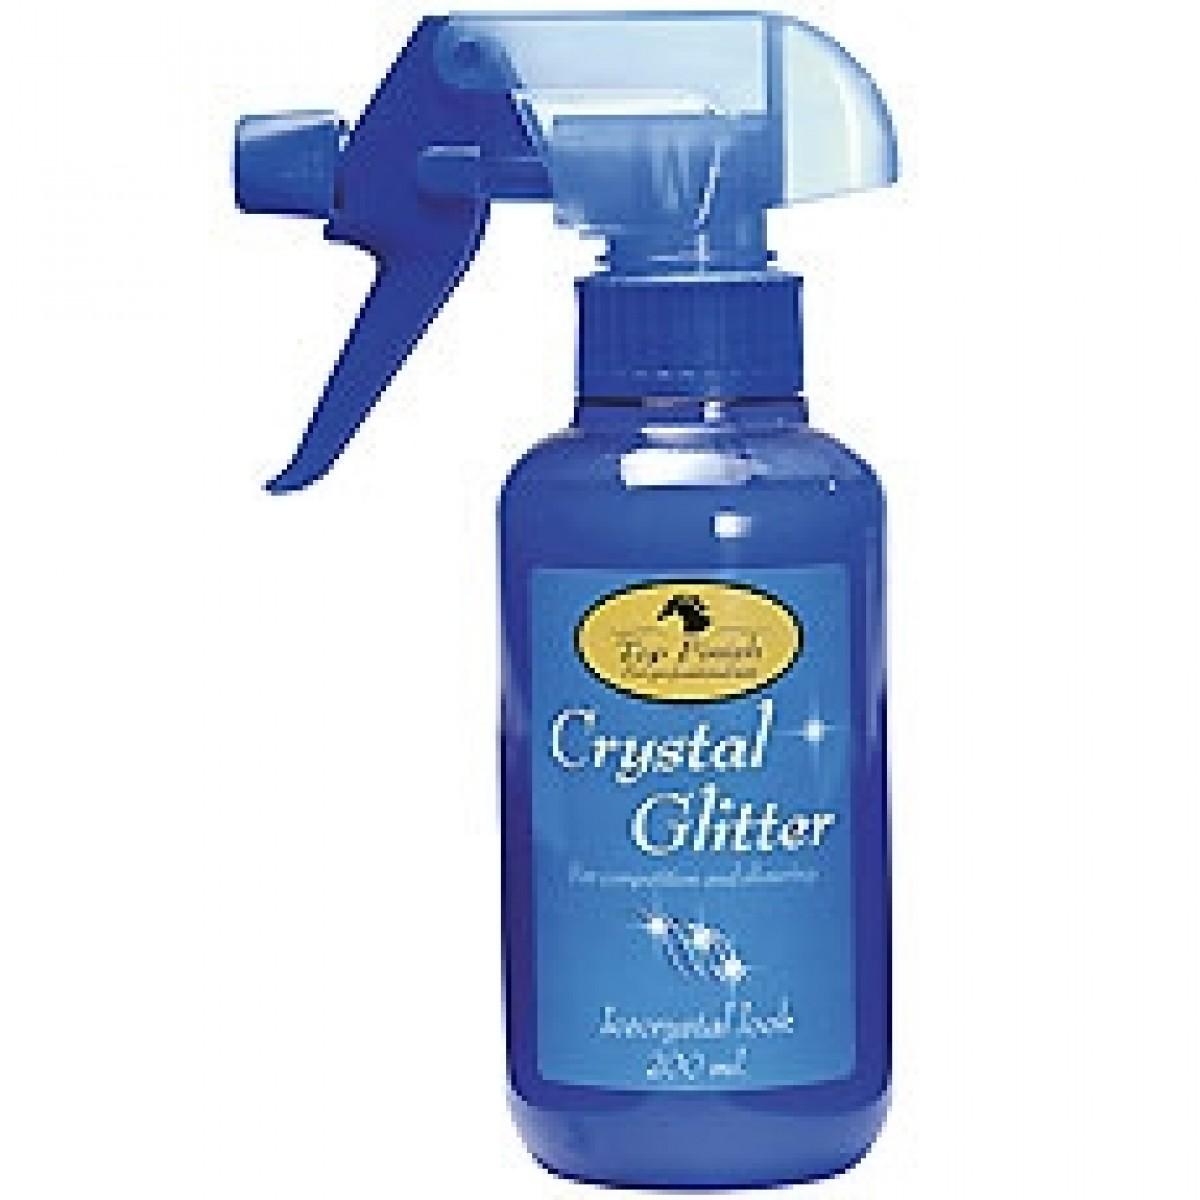 Glitterspray 200 ml